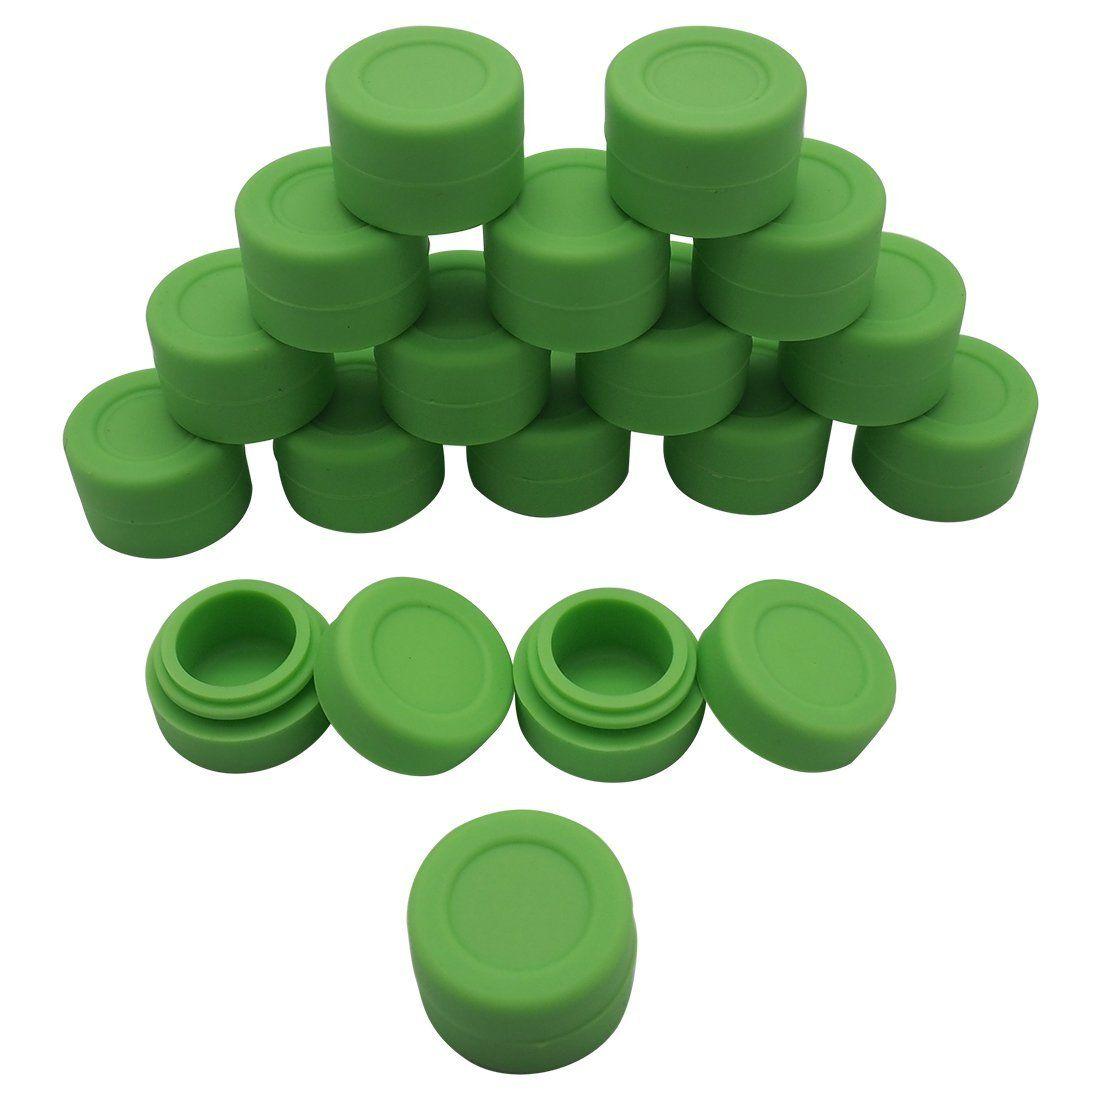 Electronic cigarette accessories FDA approved non-stick silicone jars dab wax vaporizer oil container FDA&LFGB silicone storage for vaporize